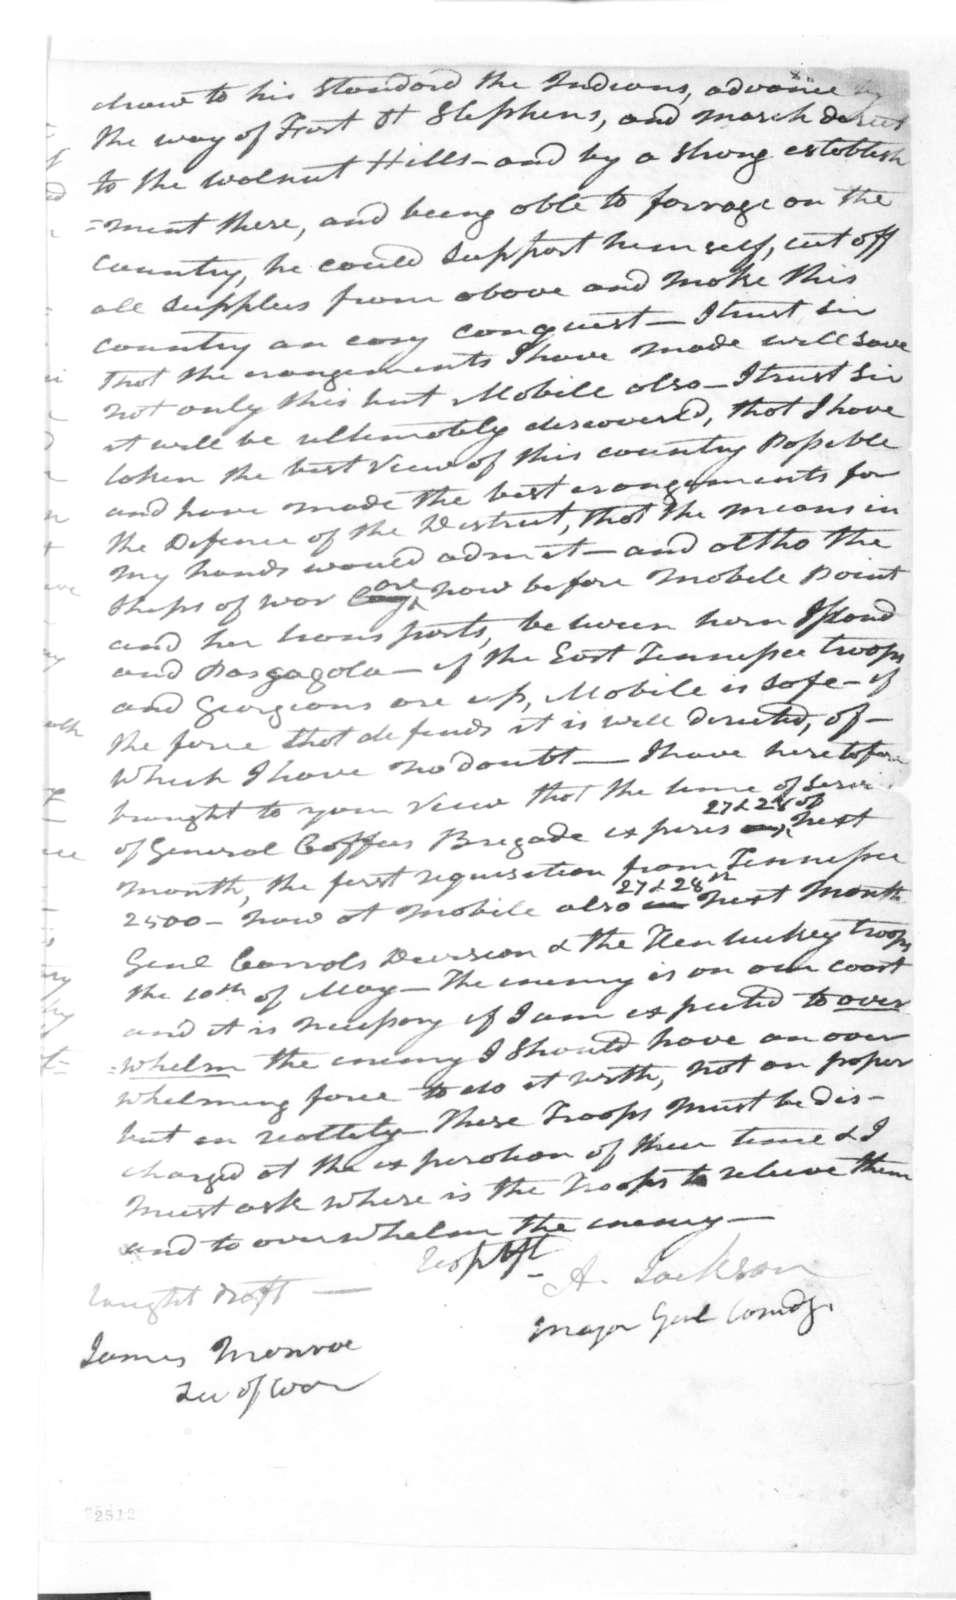 Andrew Jackson to James Monroe, February 18, 1815